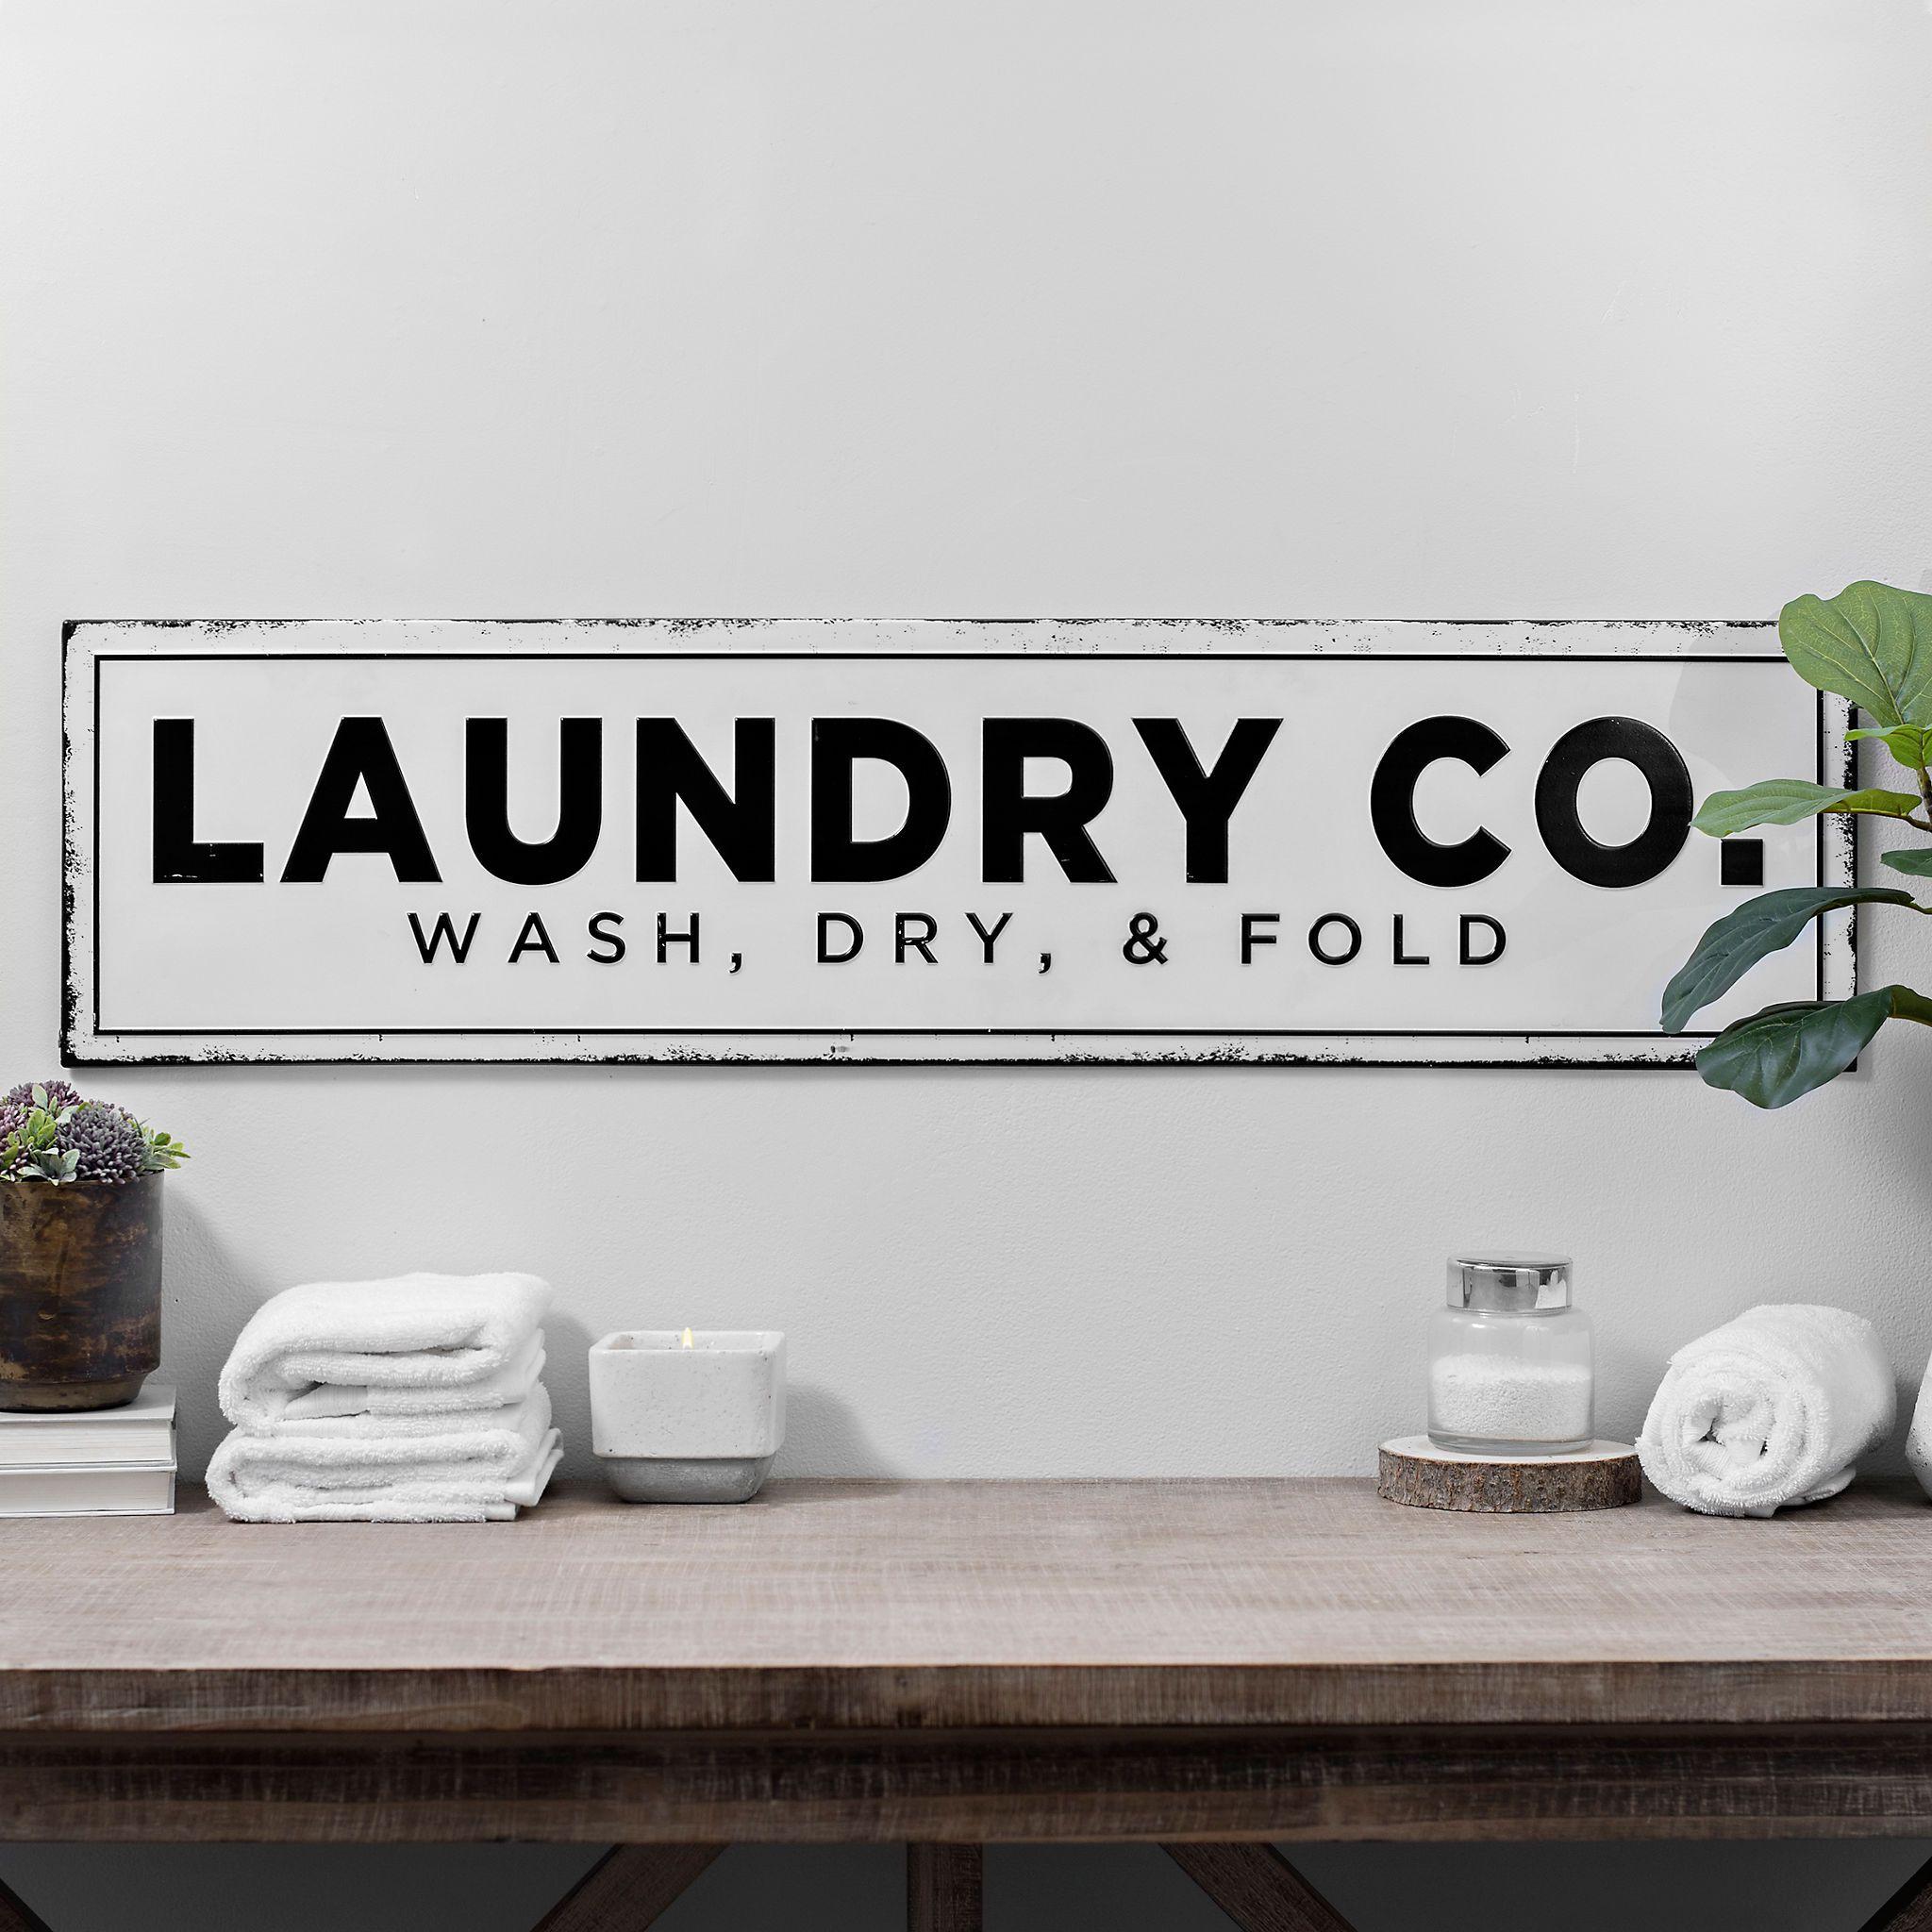 Laundry Co Metal Wall Plaque Kirklands Laundry Room Makeover Laundry Room Signs Metal Wall Plaques Laundry room signs for home diy home